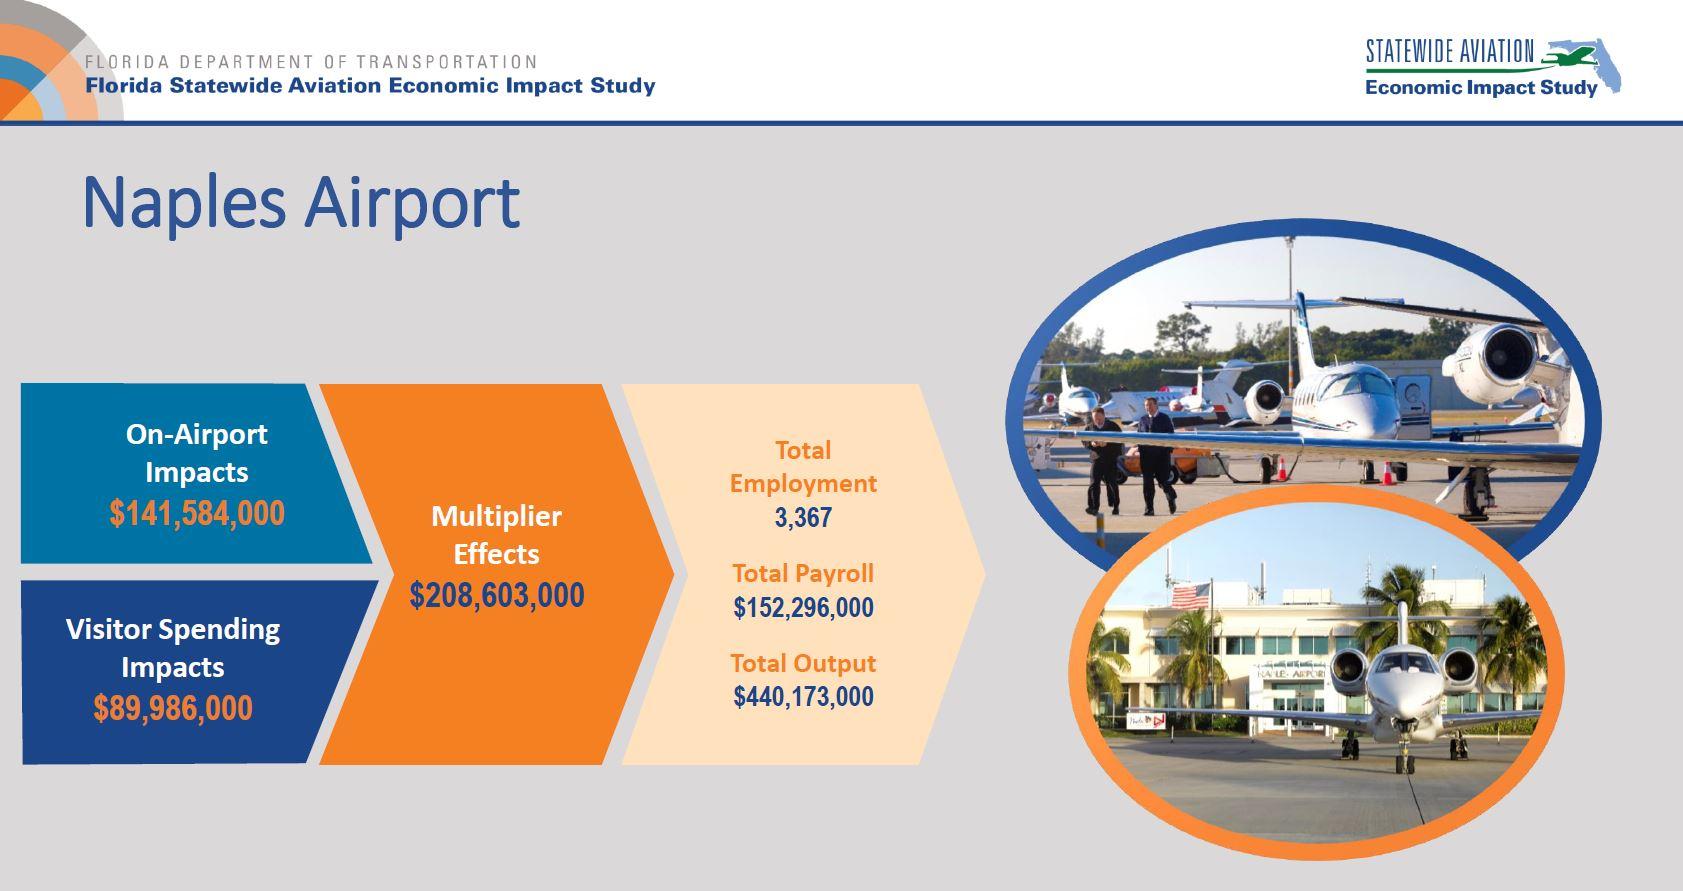 FDOT 2019 Statewide Aviation Economic Impact Study - Fly Naples